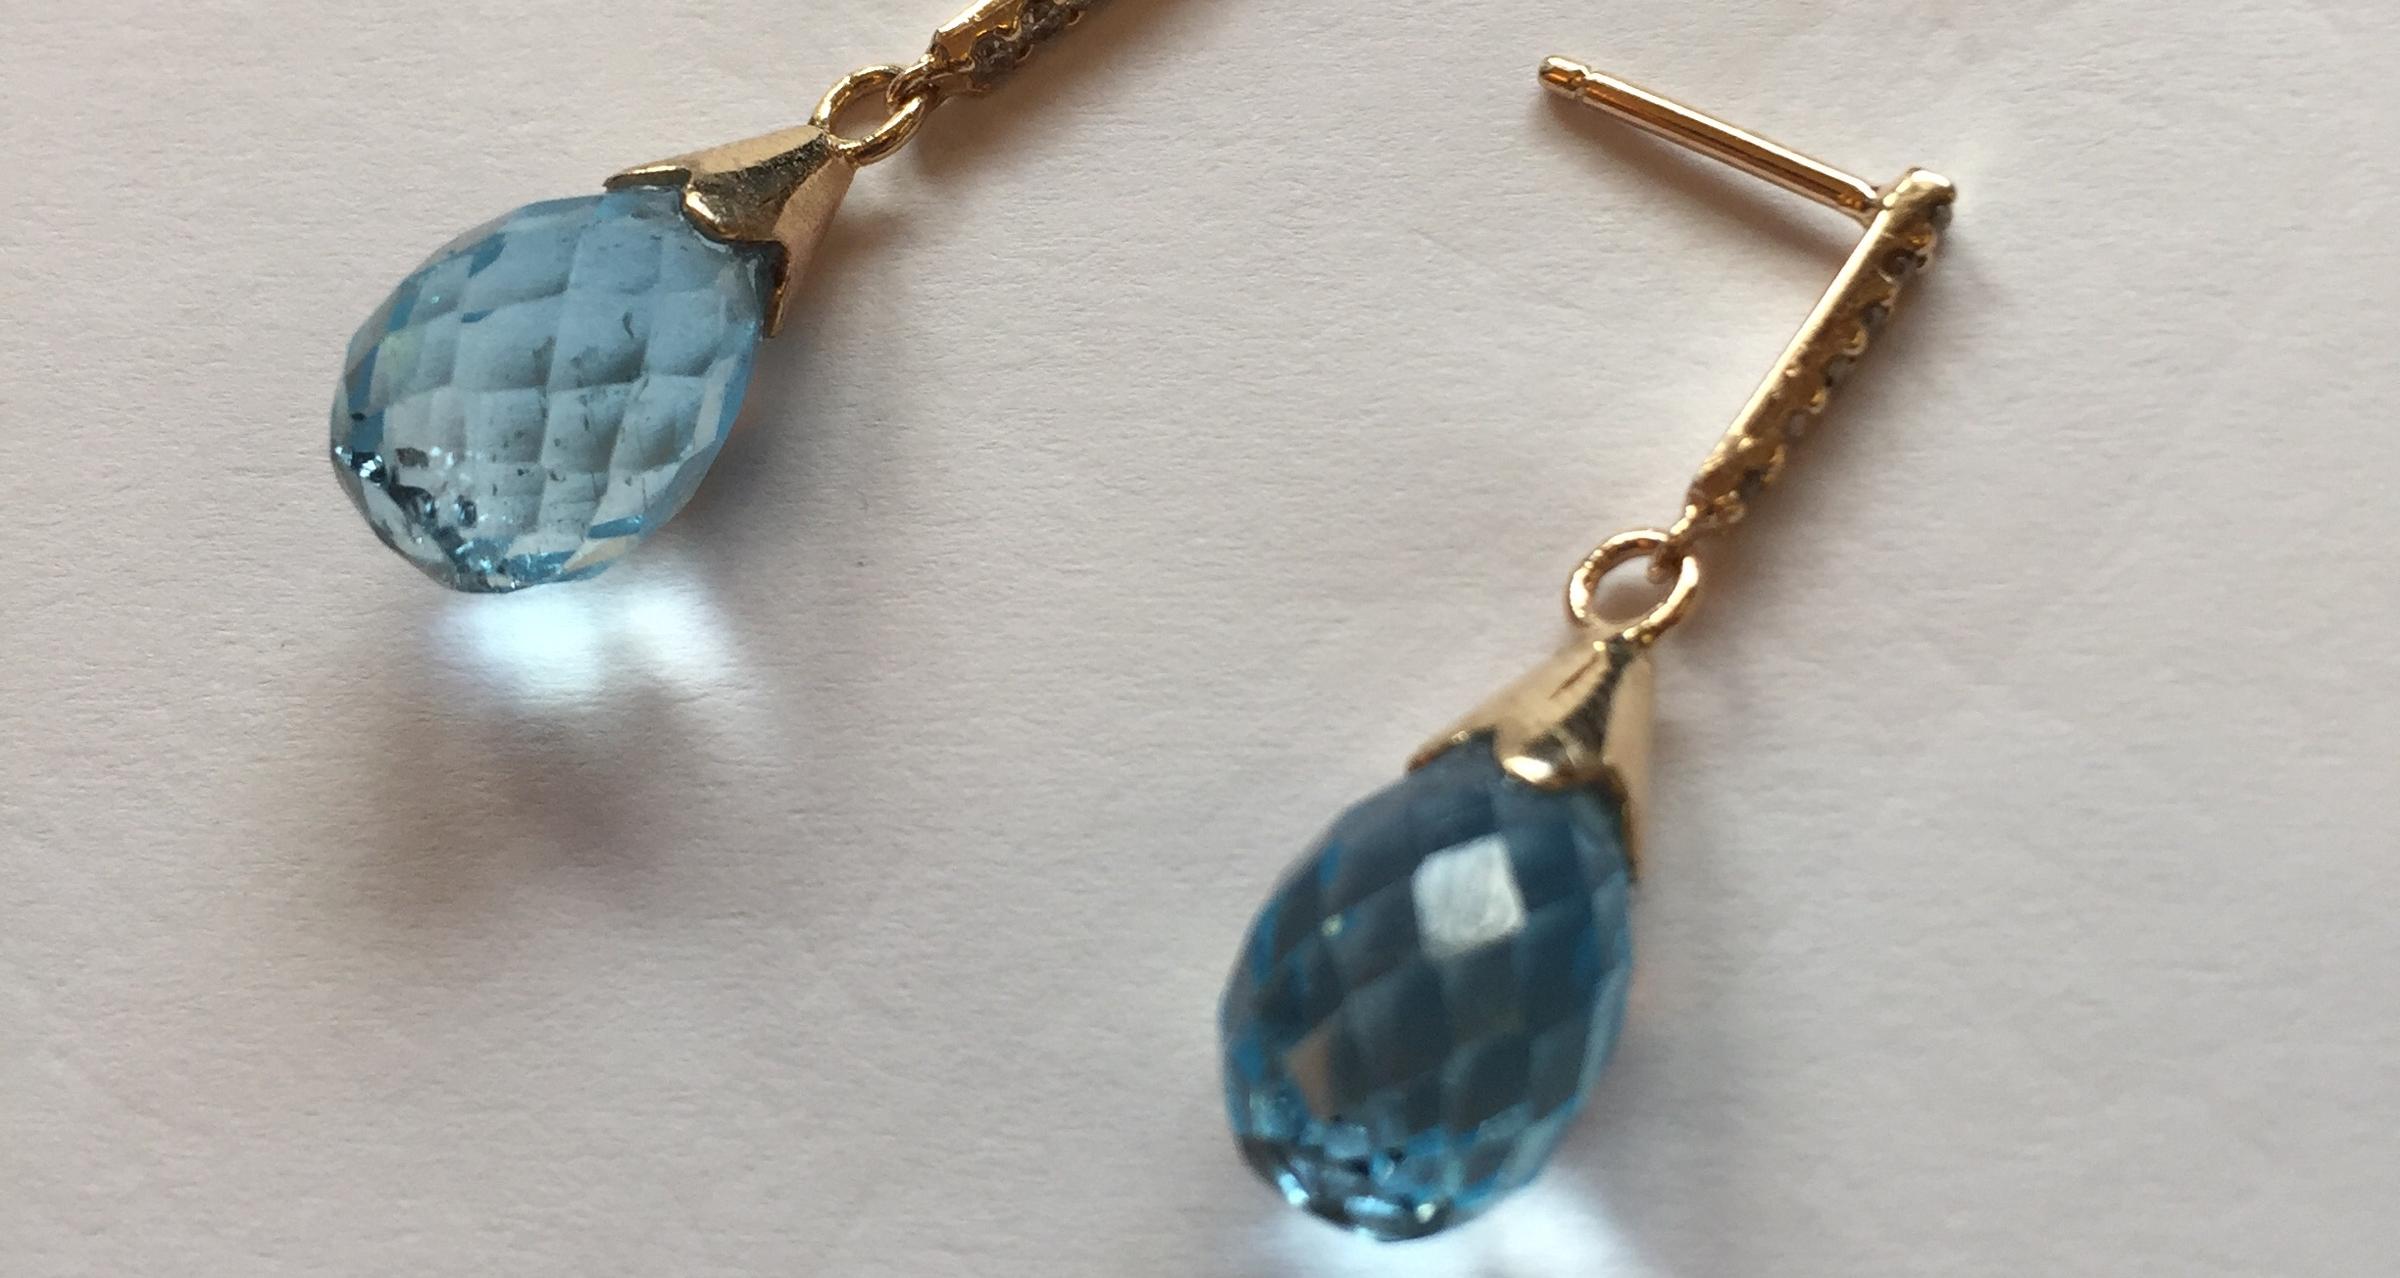 Blue Topaz earrings by Gemstone Creations.